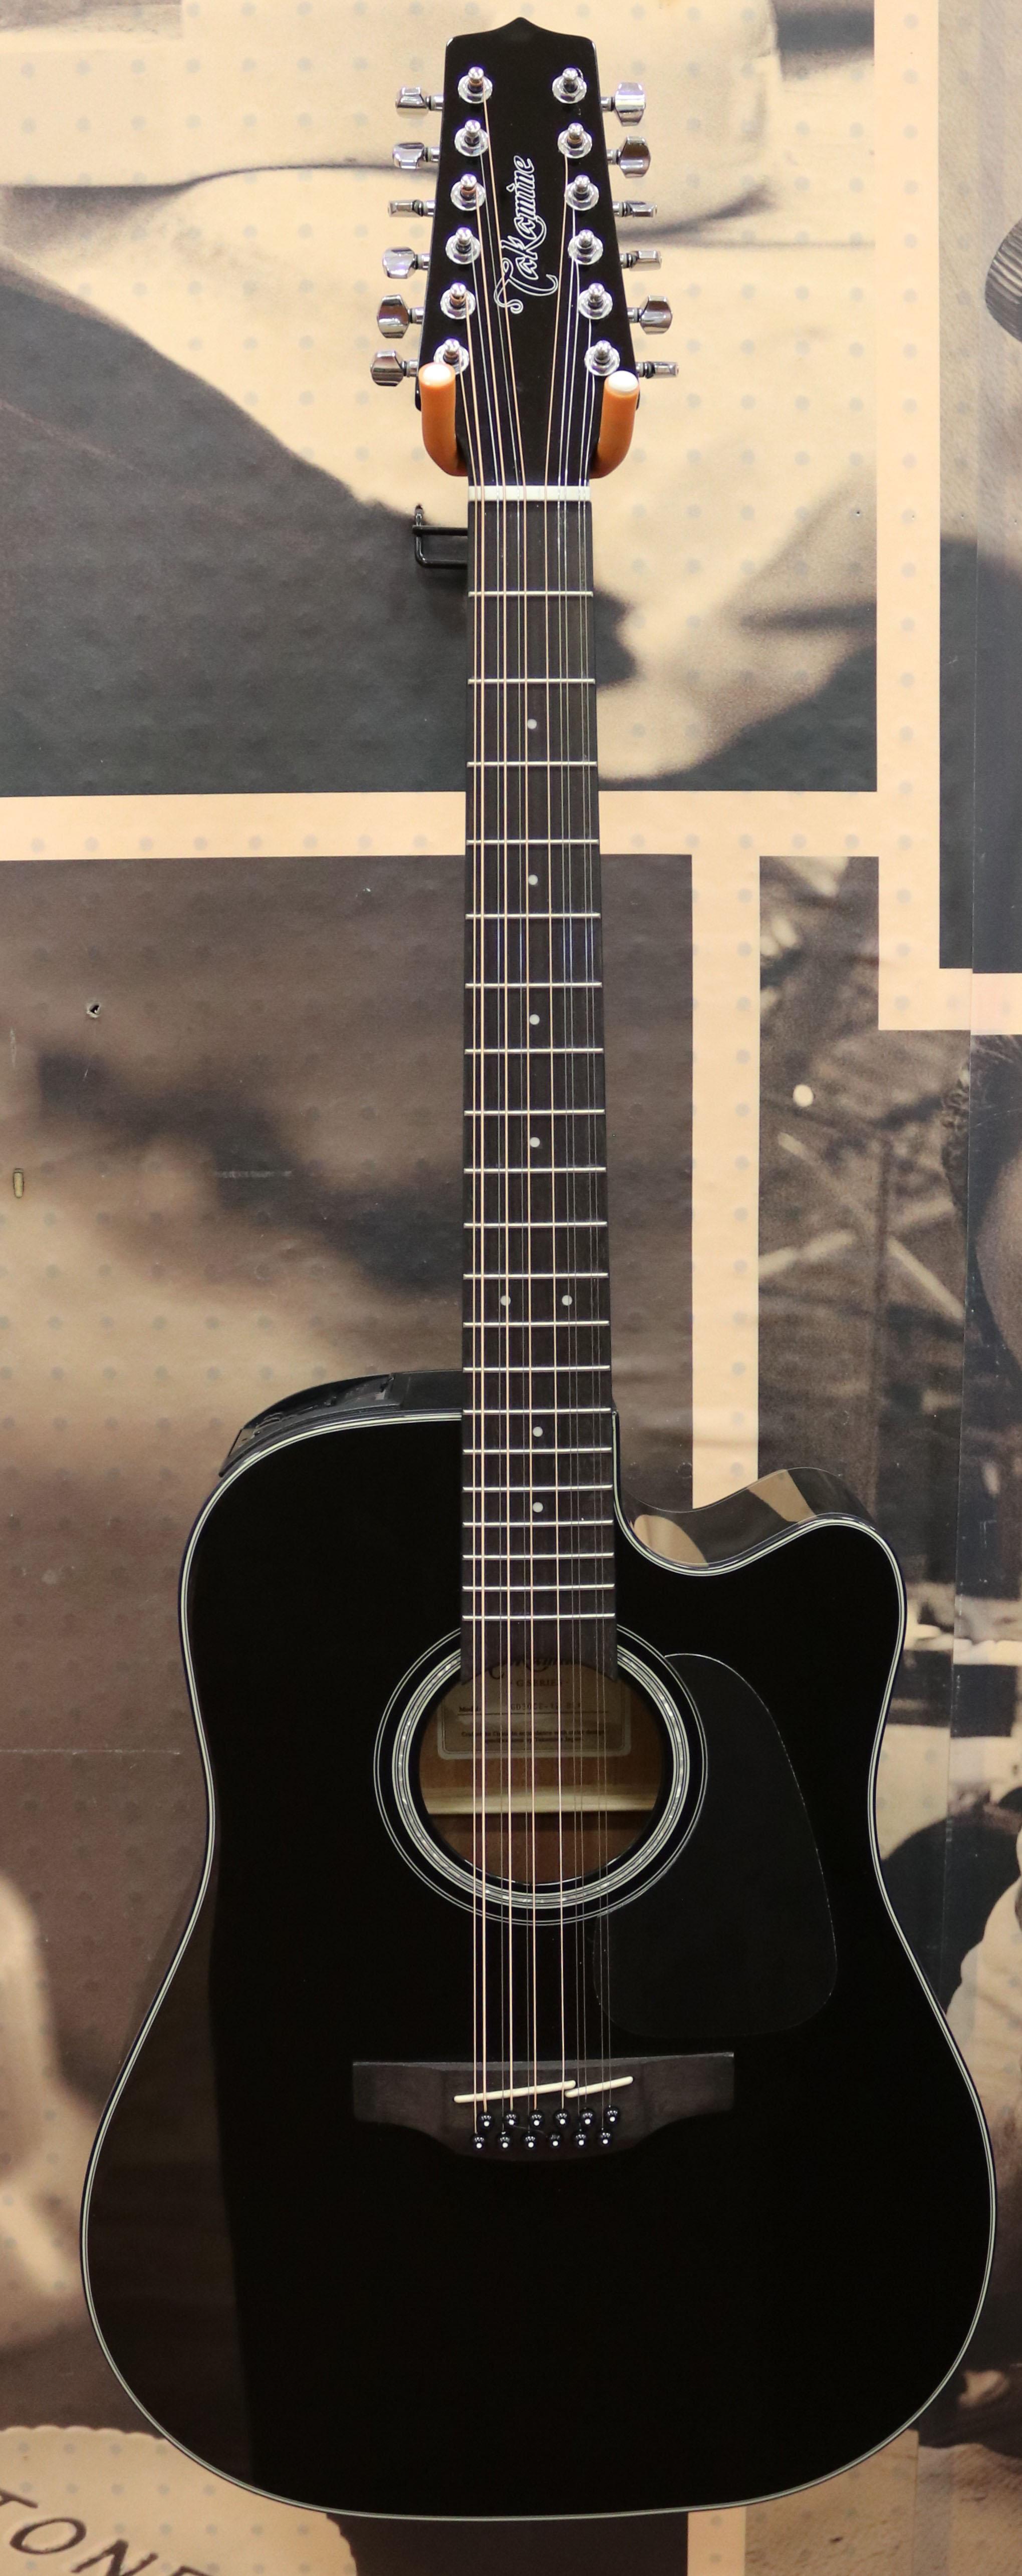 takamine gd30ce12 12 string dreadnought acoustic electric guitar black ebay. Black Bedroom Furniture Sets. Home Design Ideas